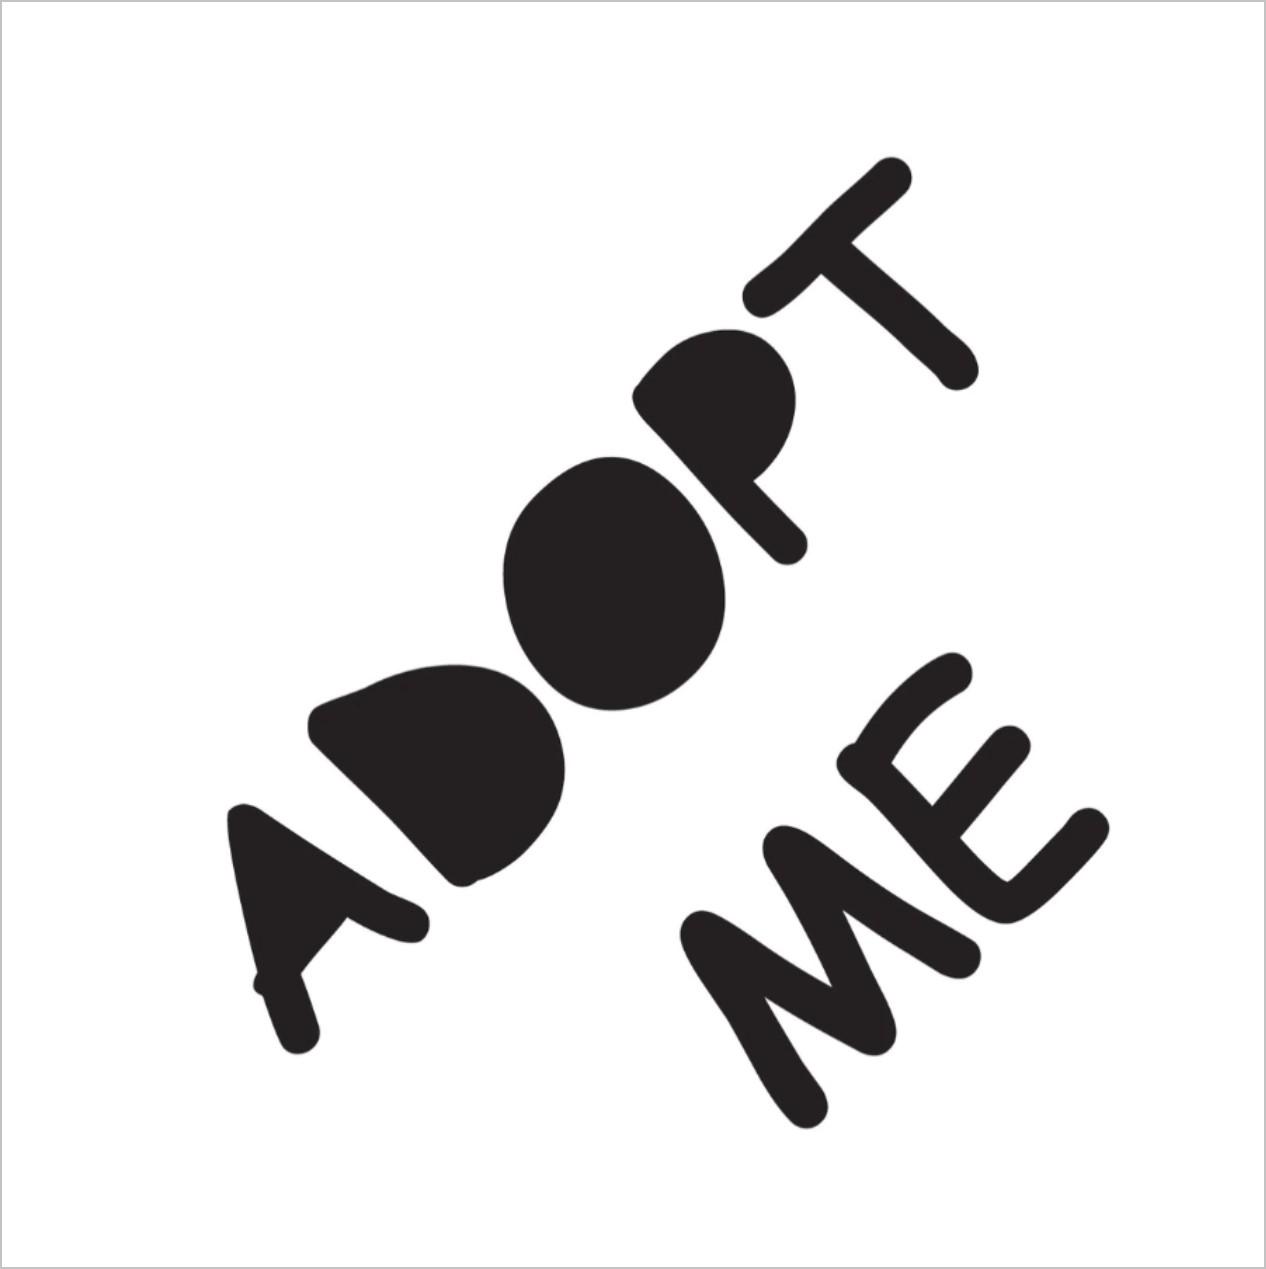 Adopt Me Professional Stencil Insert